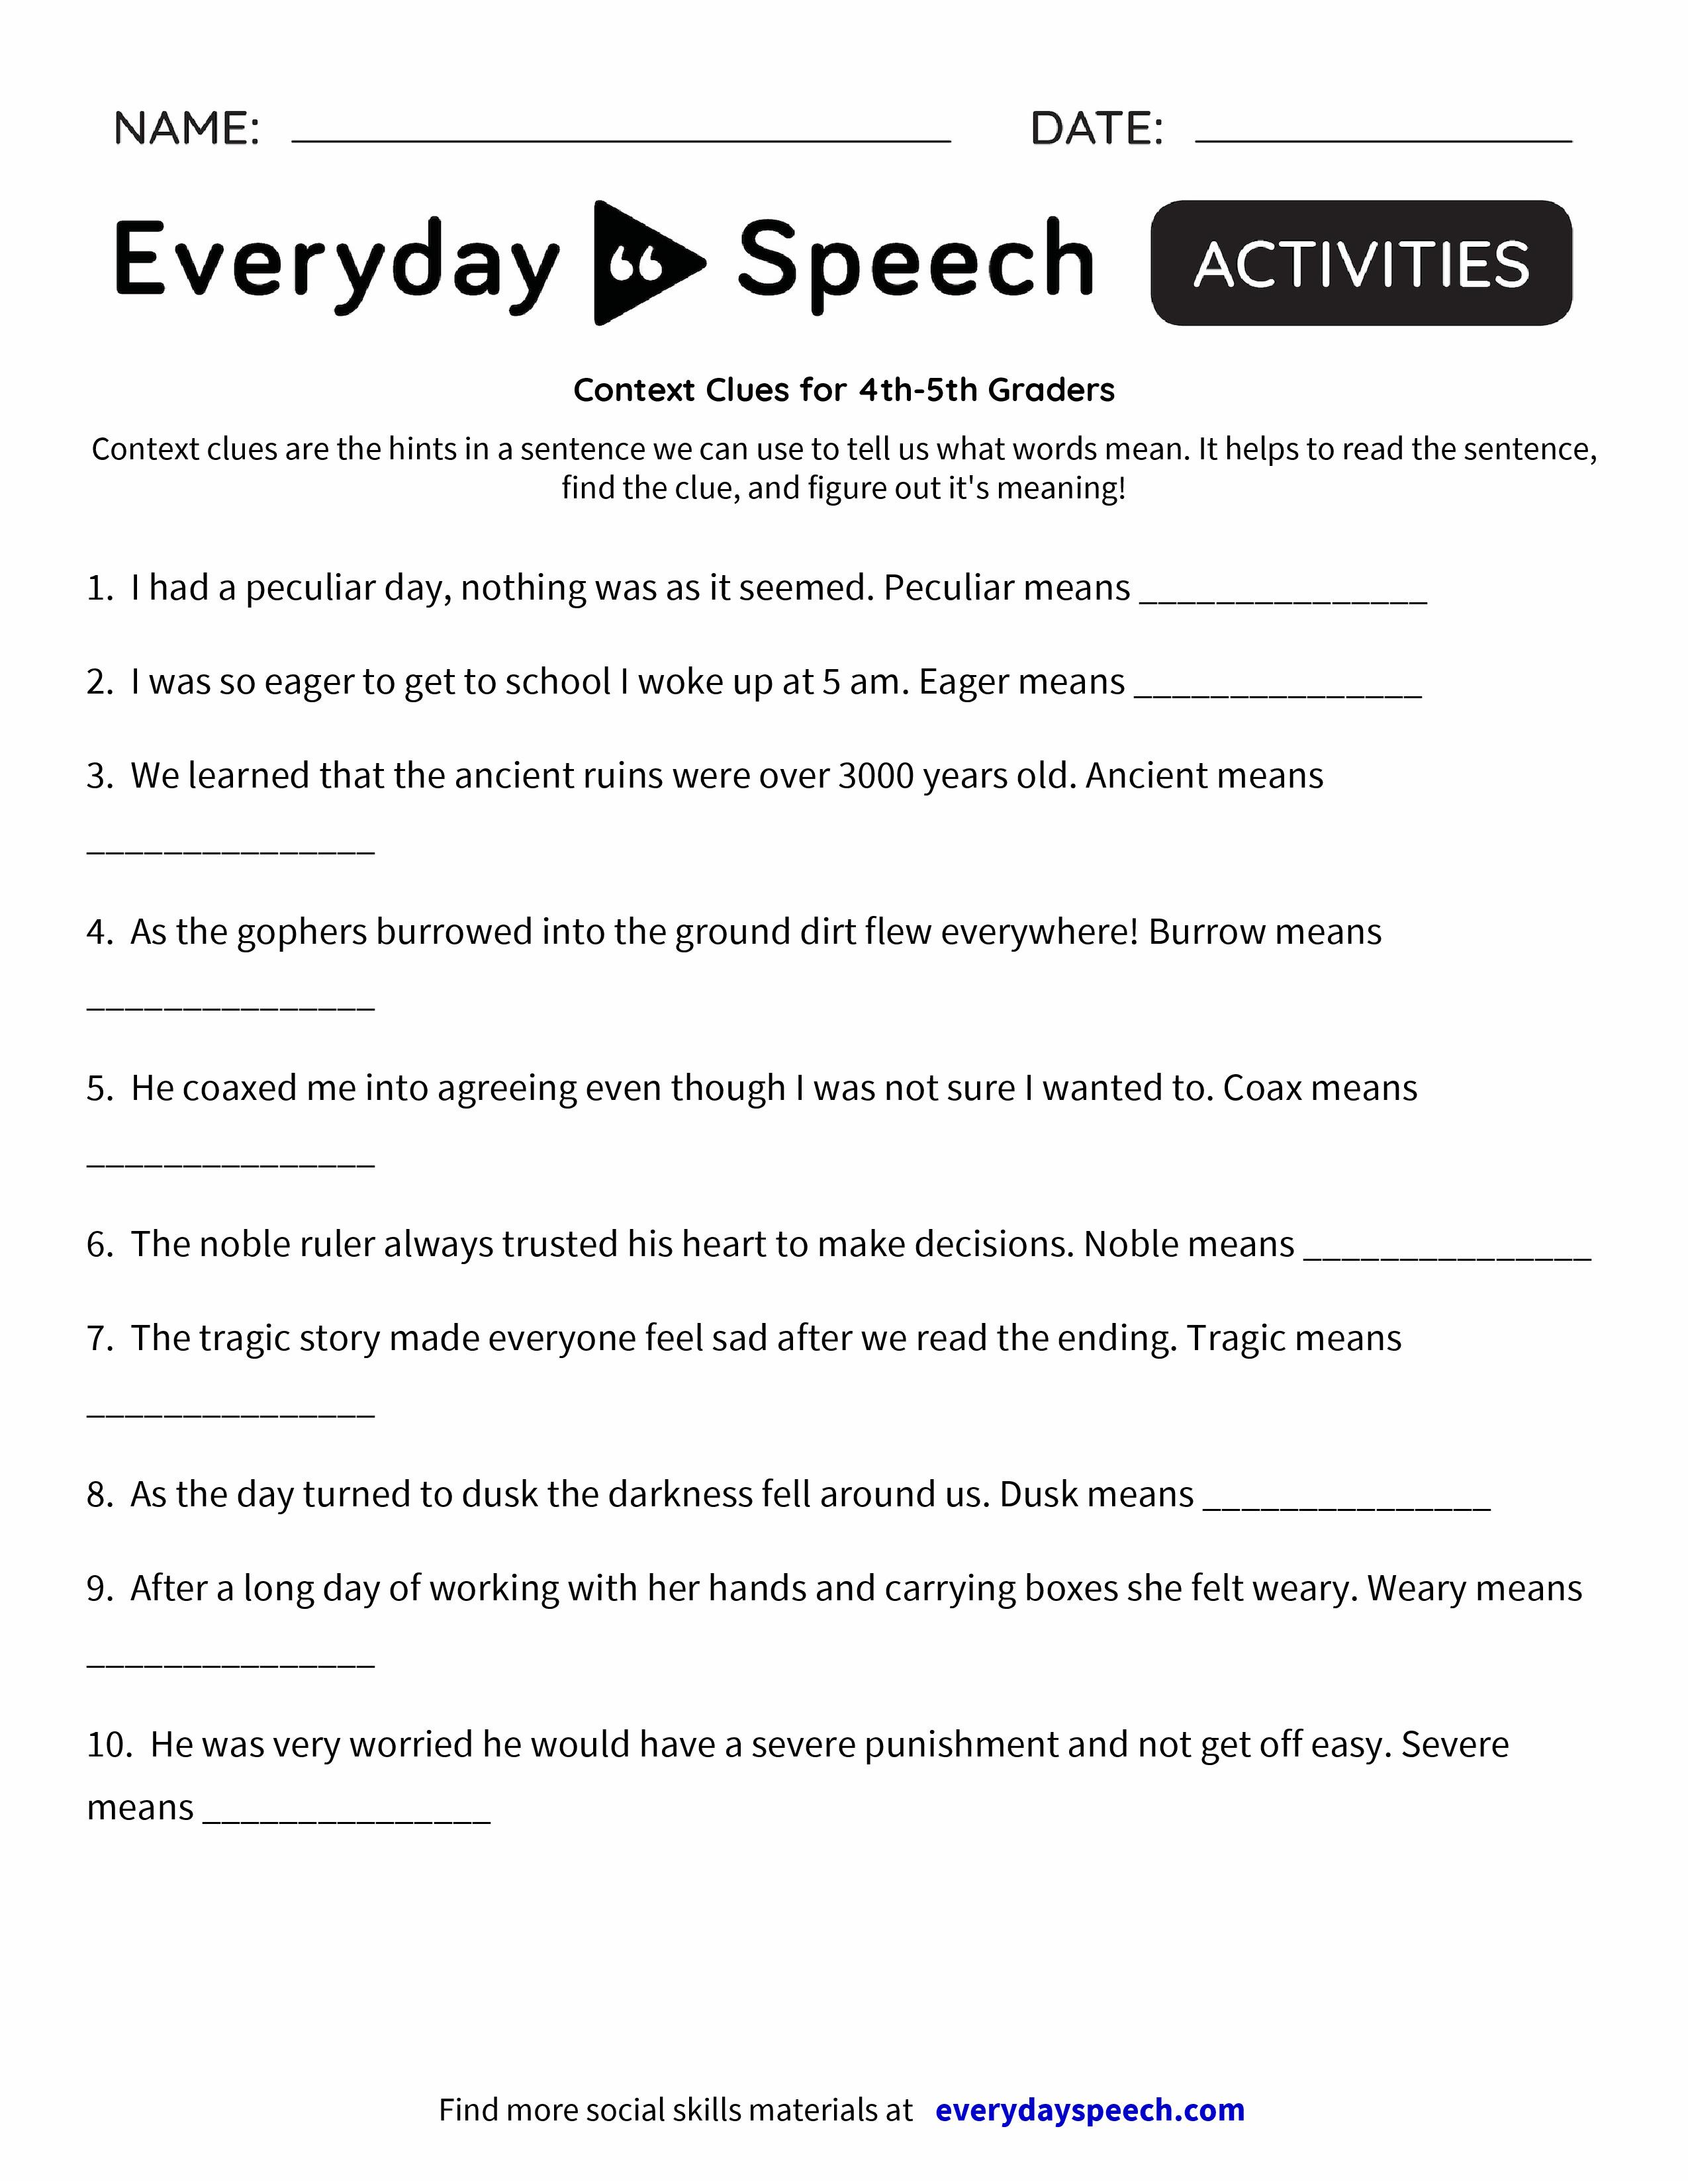 Division Worksheet For Grade 2 Pdf Blank Ruler Template  Virtrencom Maniac Magee Worksheets with Hydrocarbon Worksheet Excel Blank Ruler Worksheet Solving Multi Step Equations Worksheet  Frank Schaffer Publications Worksheets Word